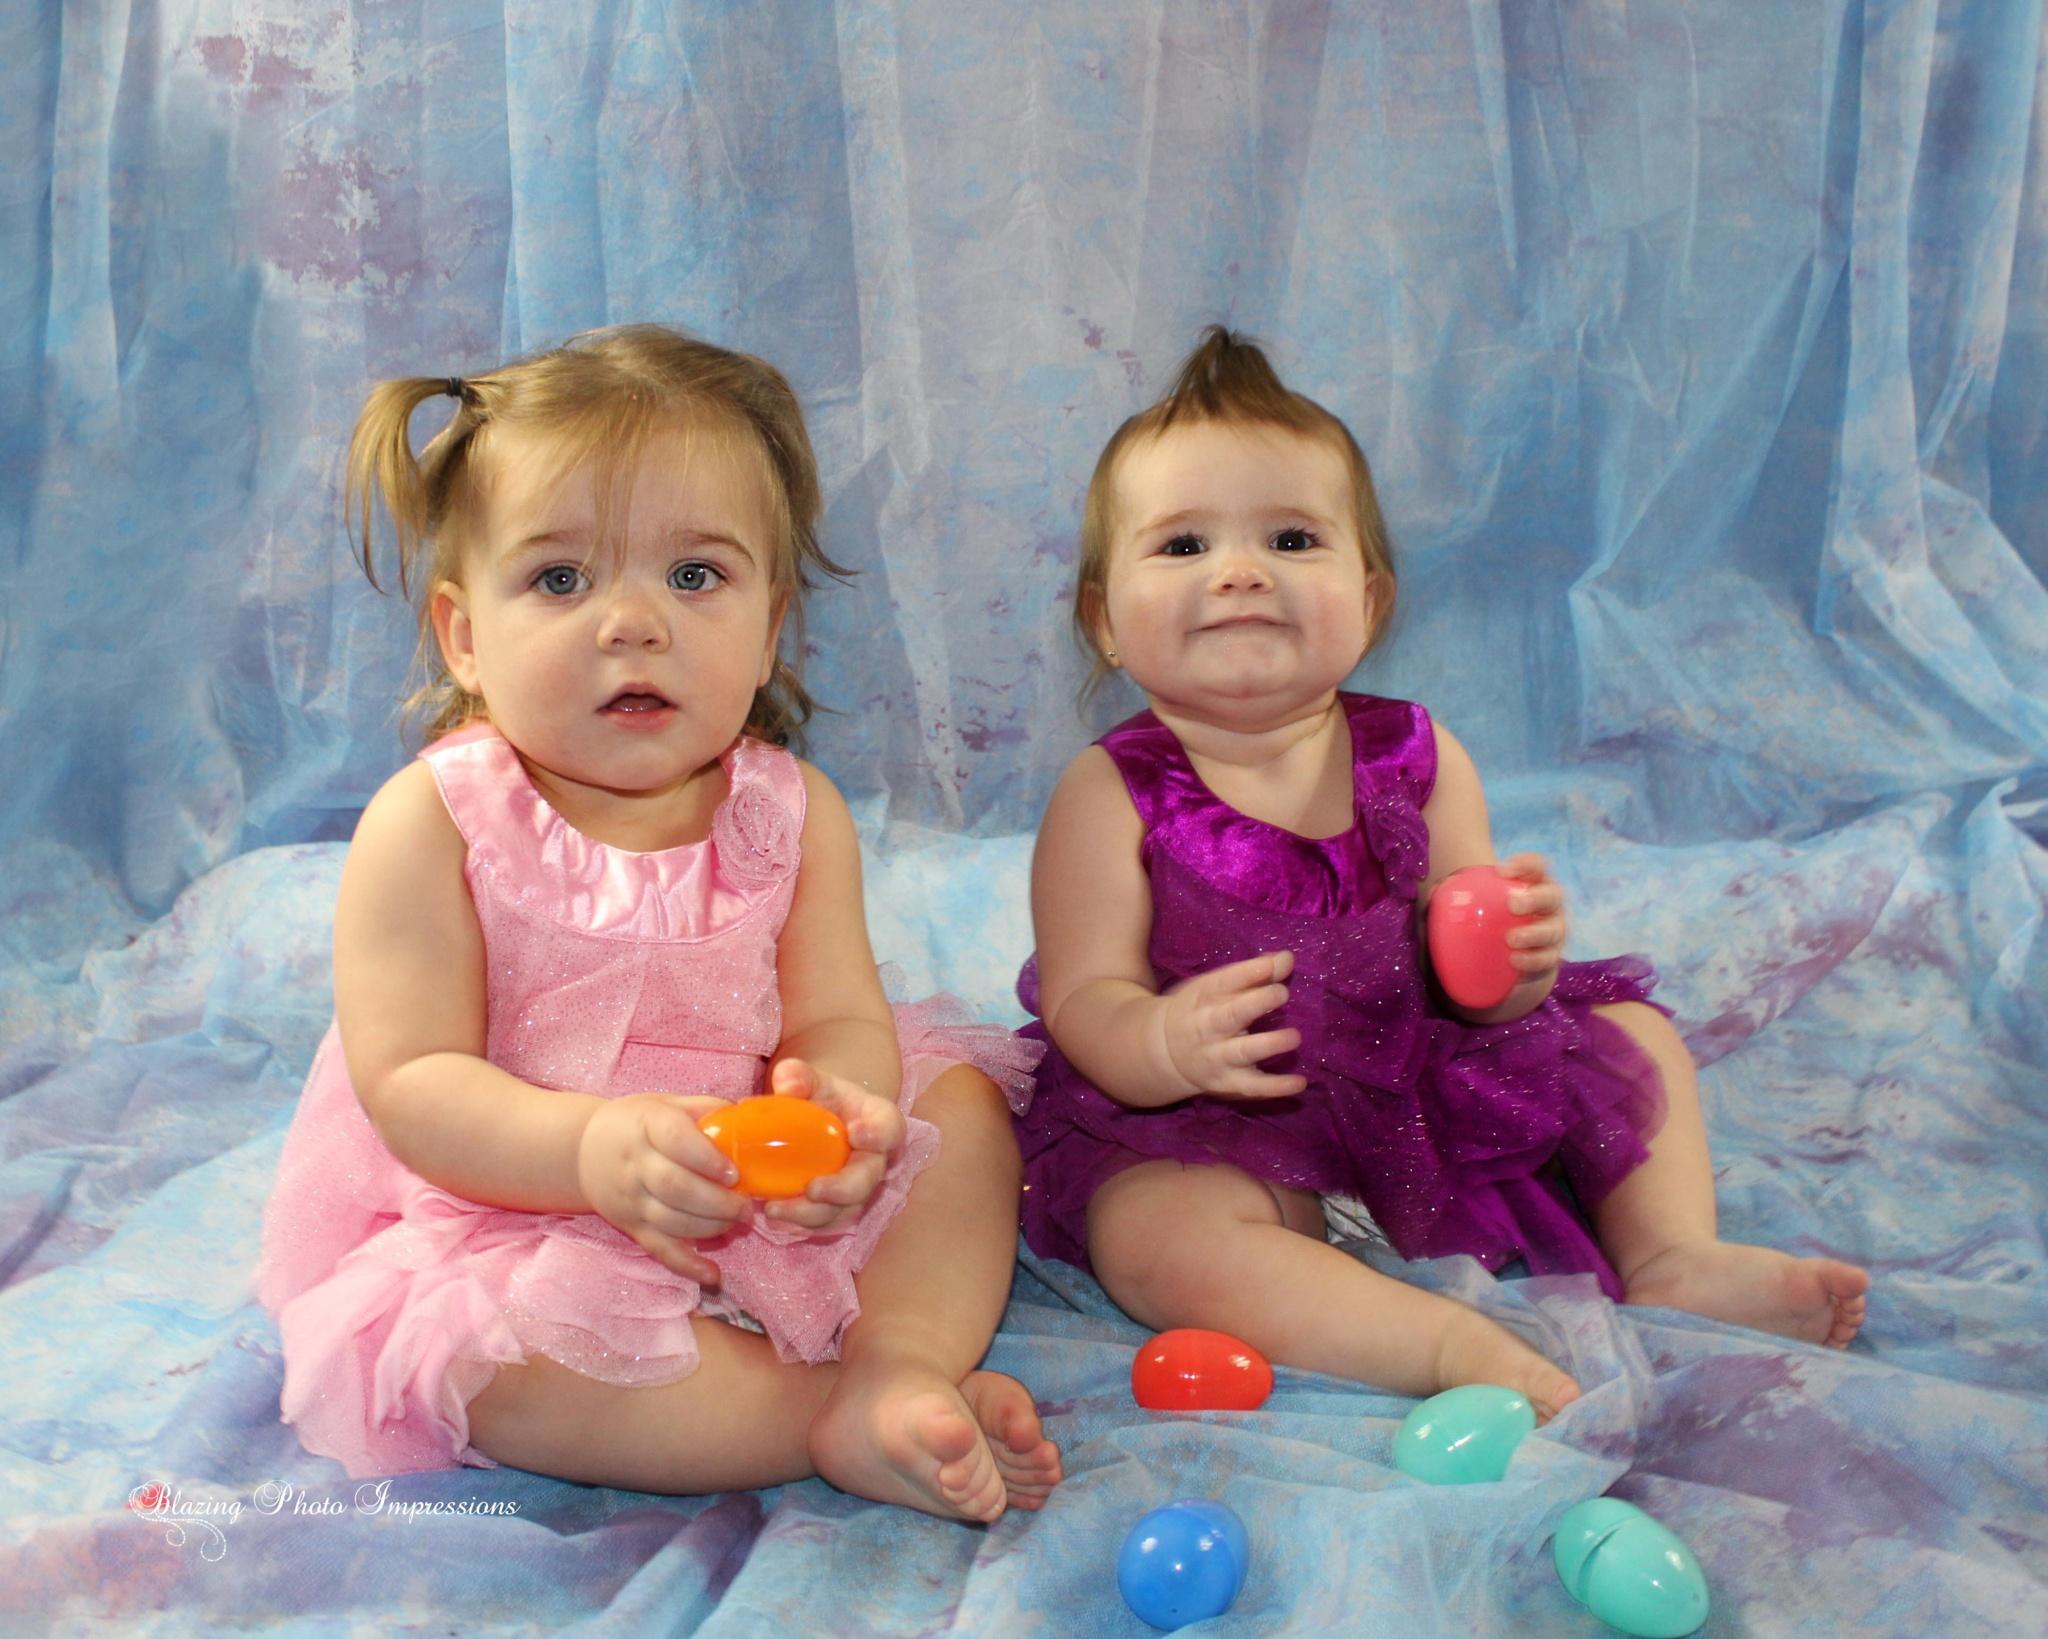 Easter Babies 1 by Nanehi Moon